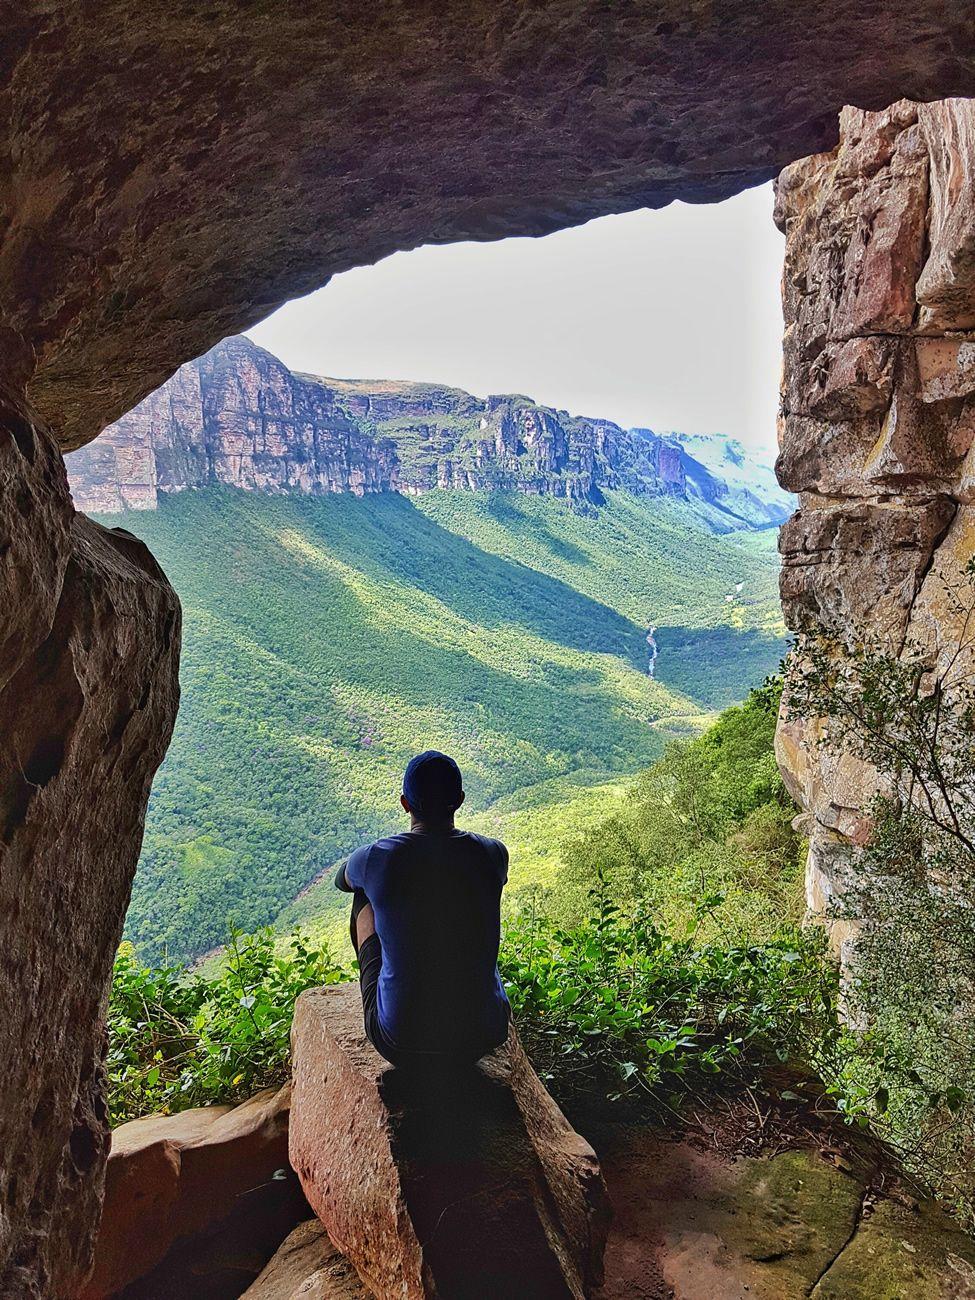 Morro do Castelo, Vale do Pati, Chapada Diamantina - Bahia